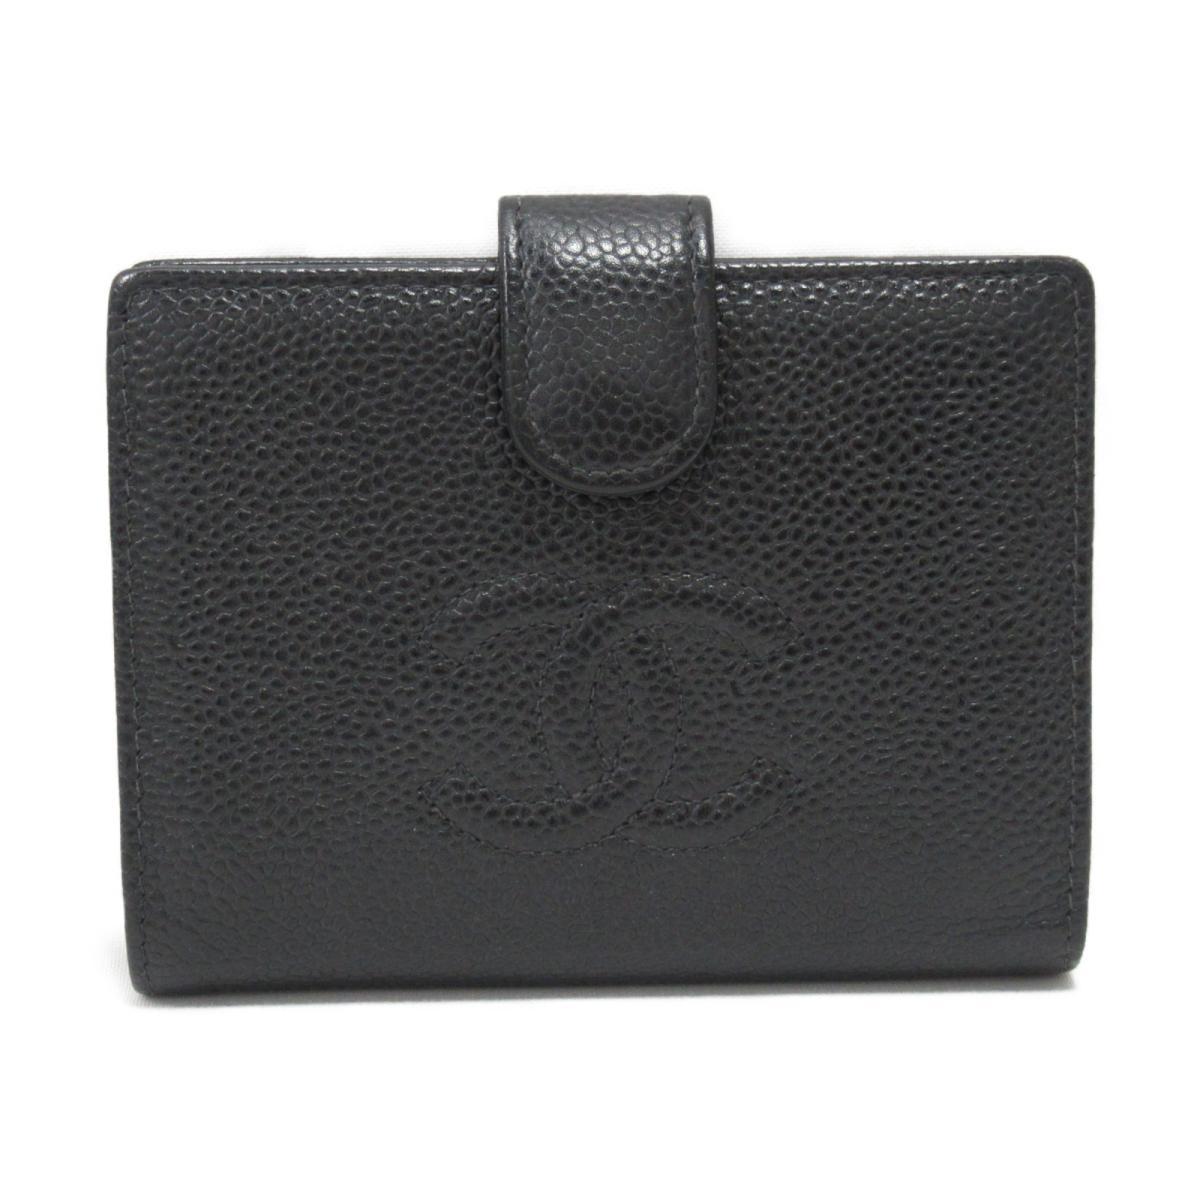 二つ折財布 財布